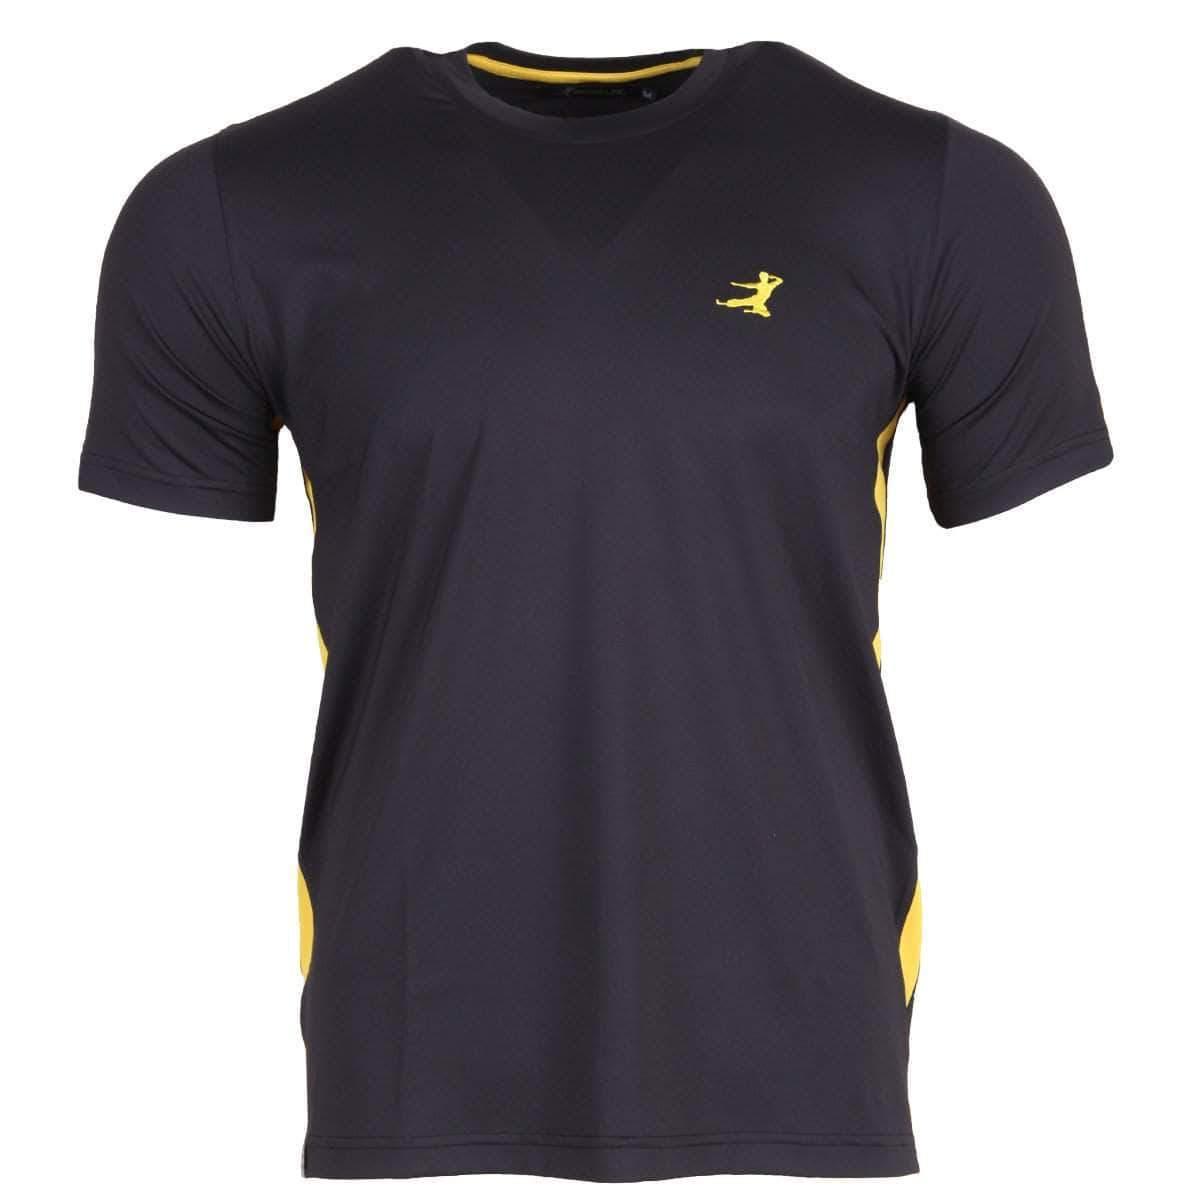 Flying Man Men's Performance Shirt